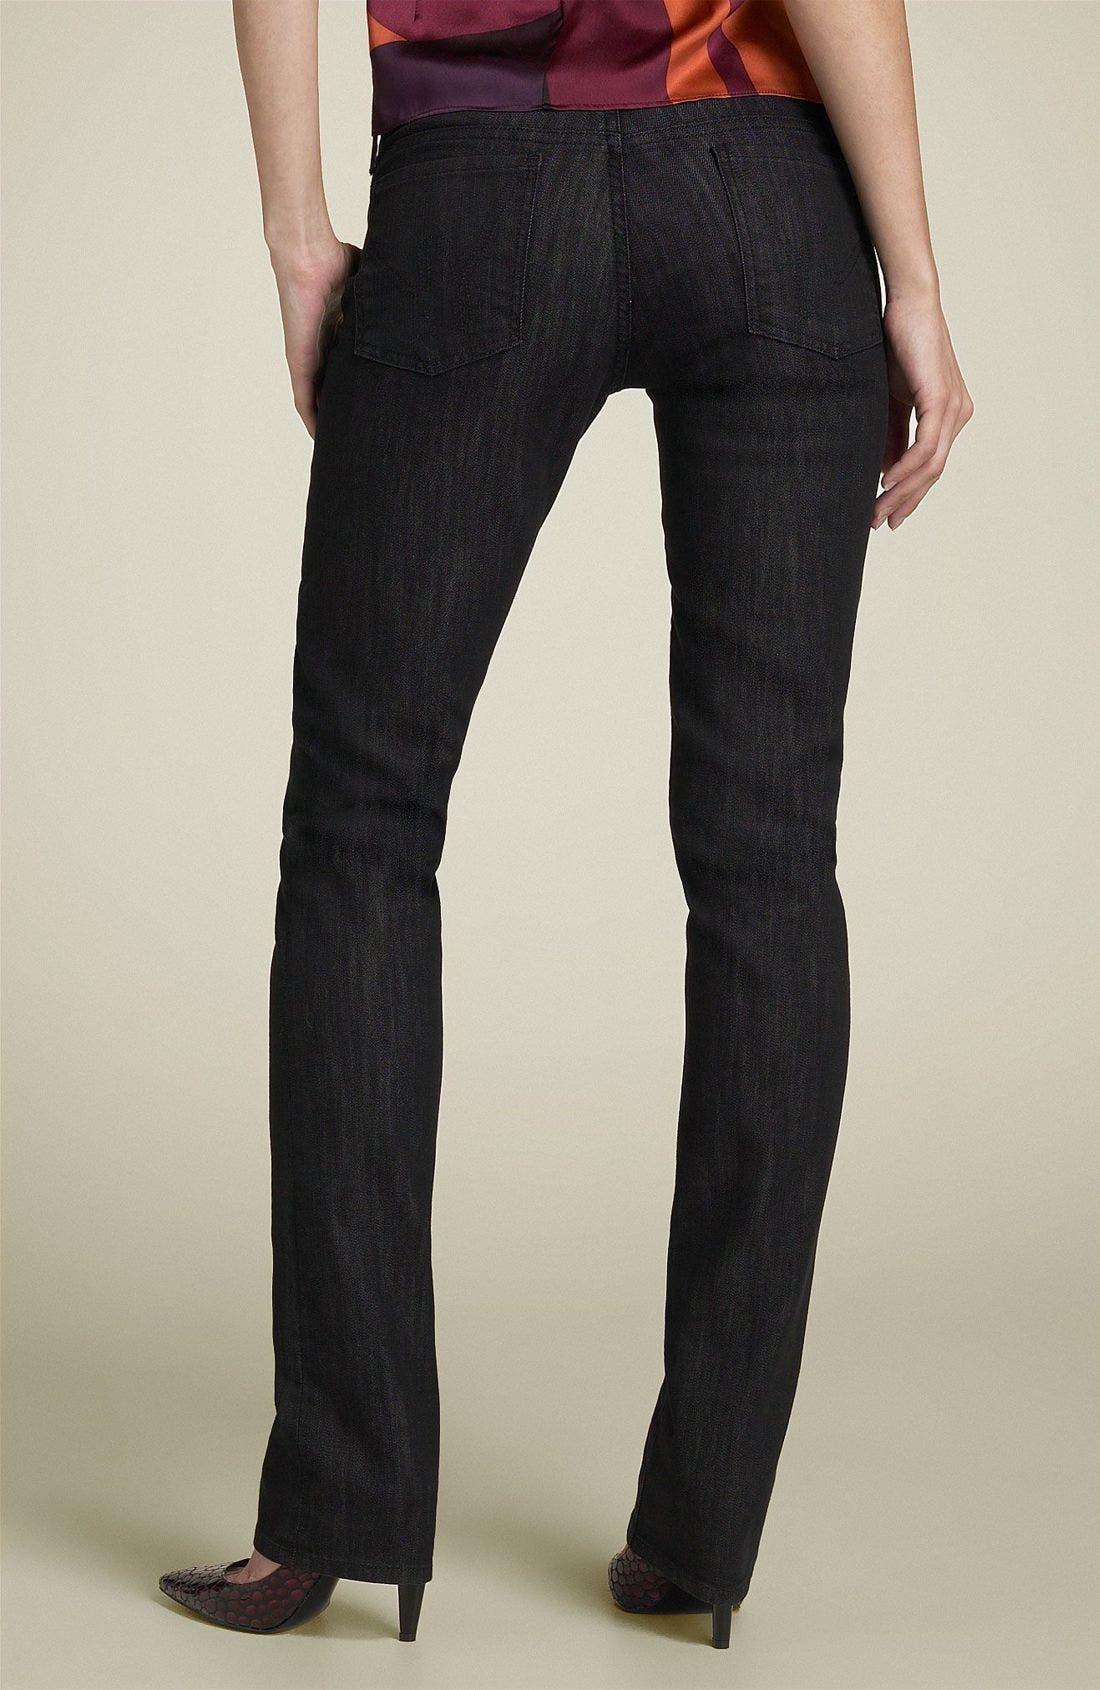 'Ava' Straight Leg Stretch Jeans,                         Main,                         color, 007